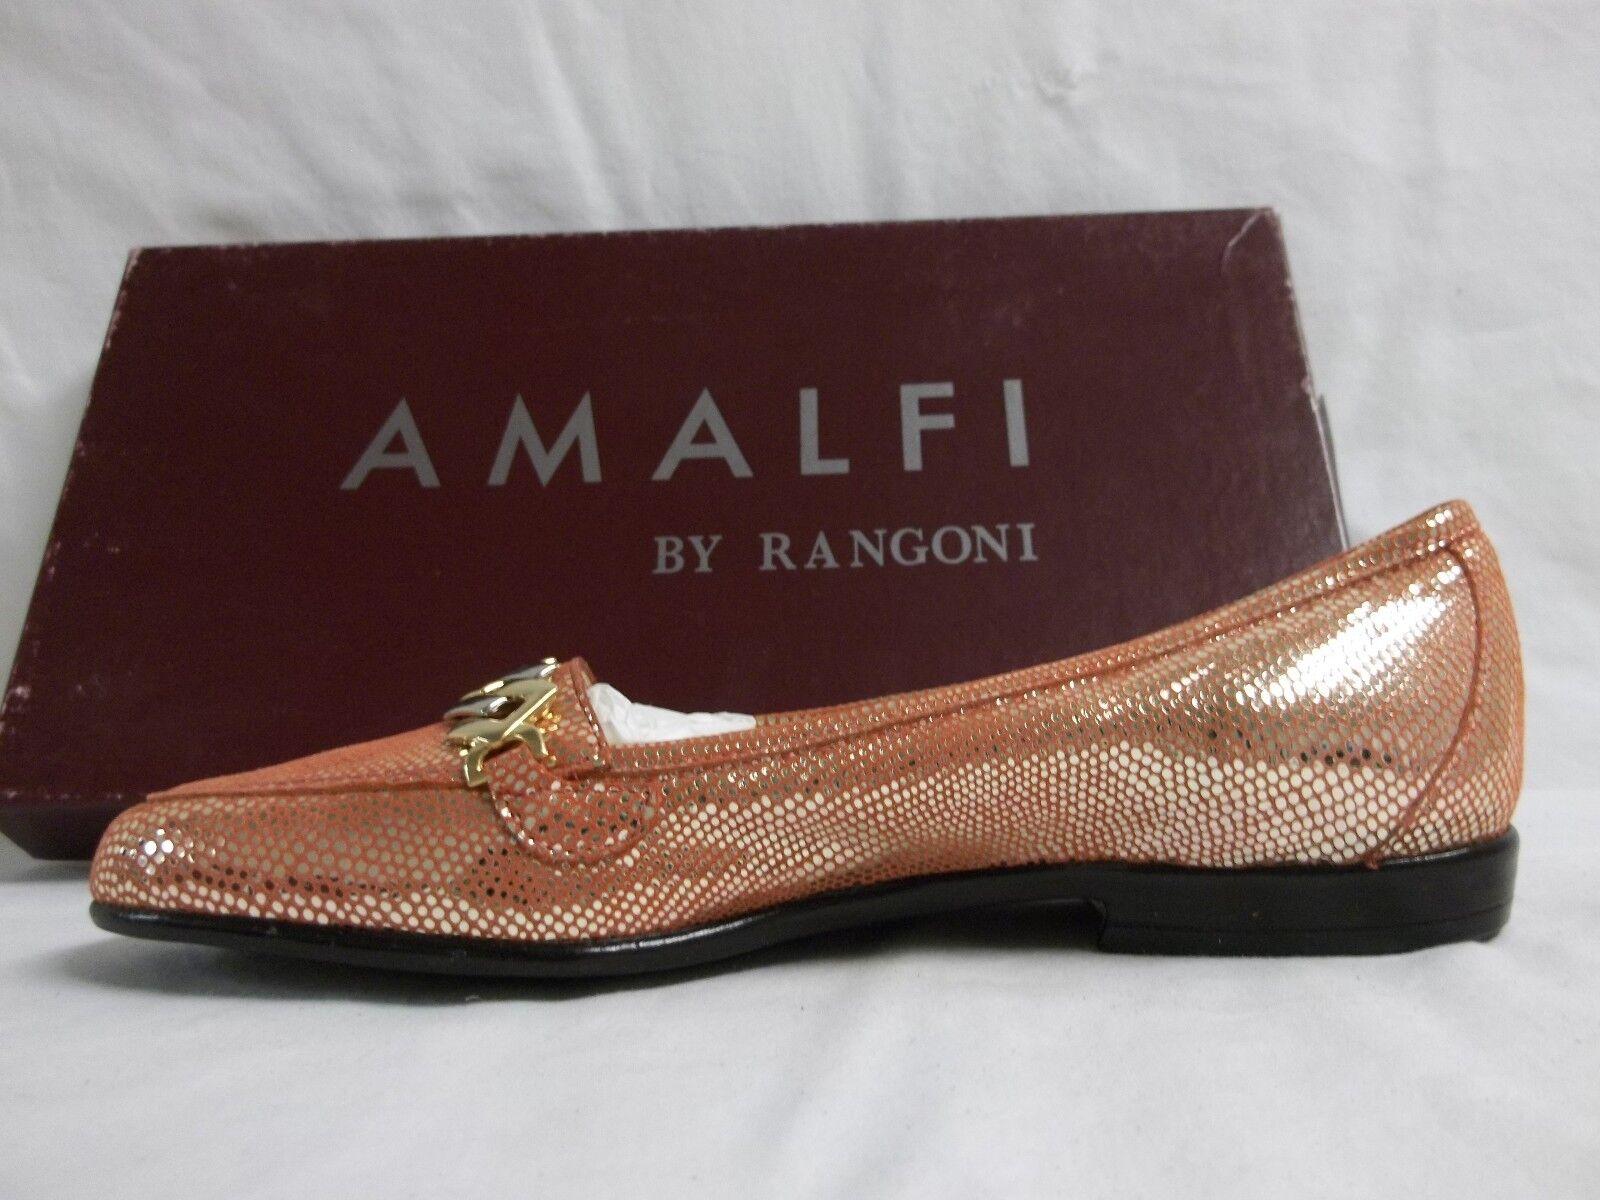 Amalfi By Rangoni Größe 5 Tulip S N Narrow Oste Tulip 5 Flats Suede New Damenschuhe Schuhes 559d8d